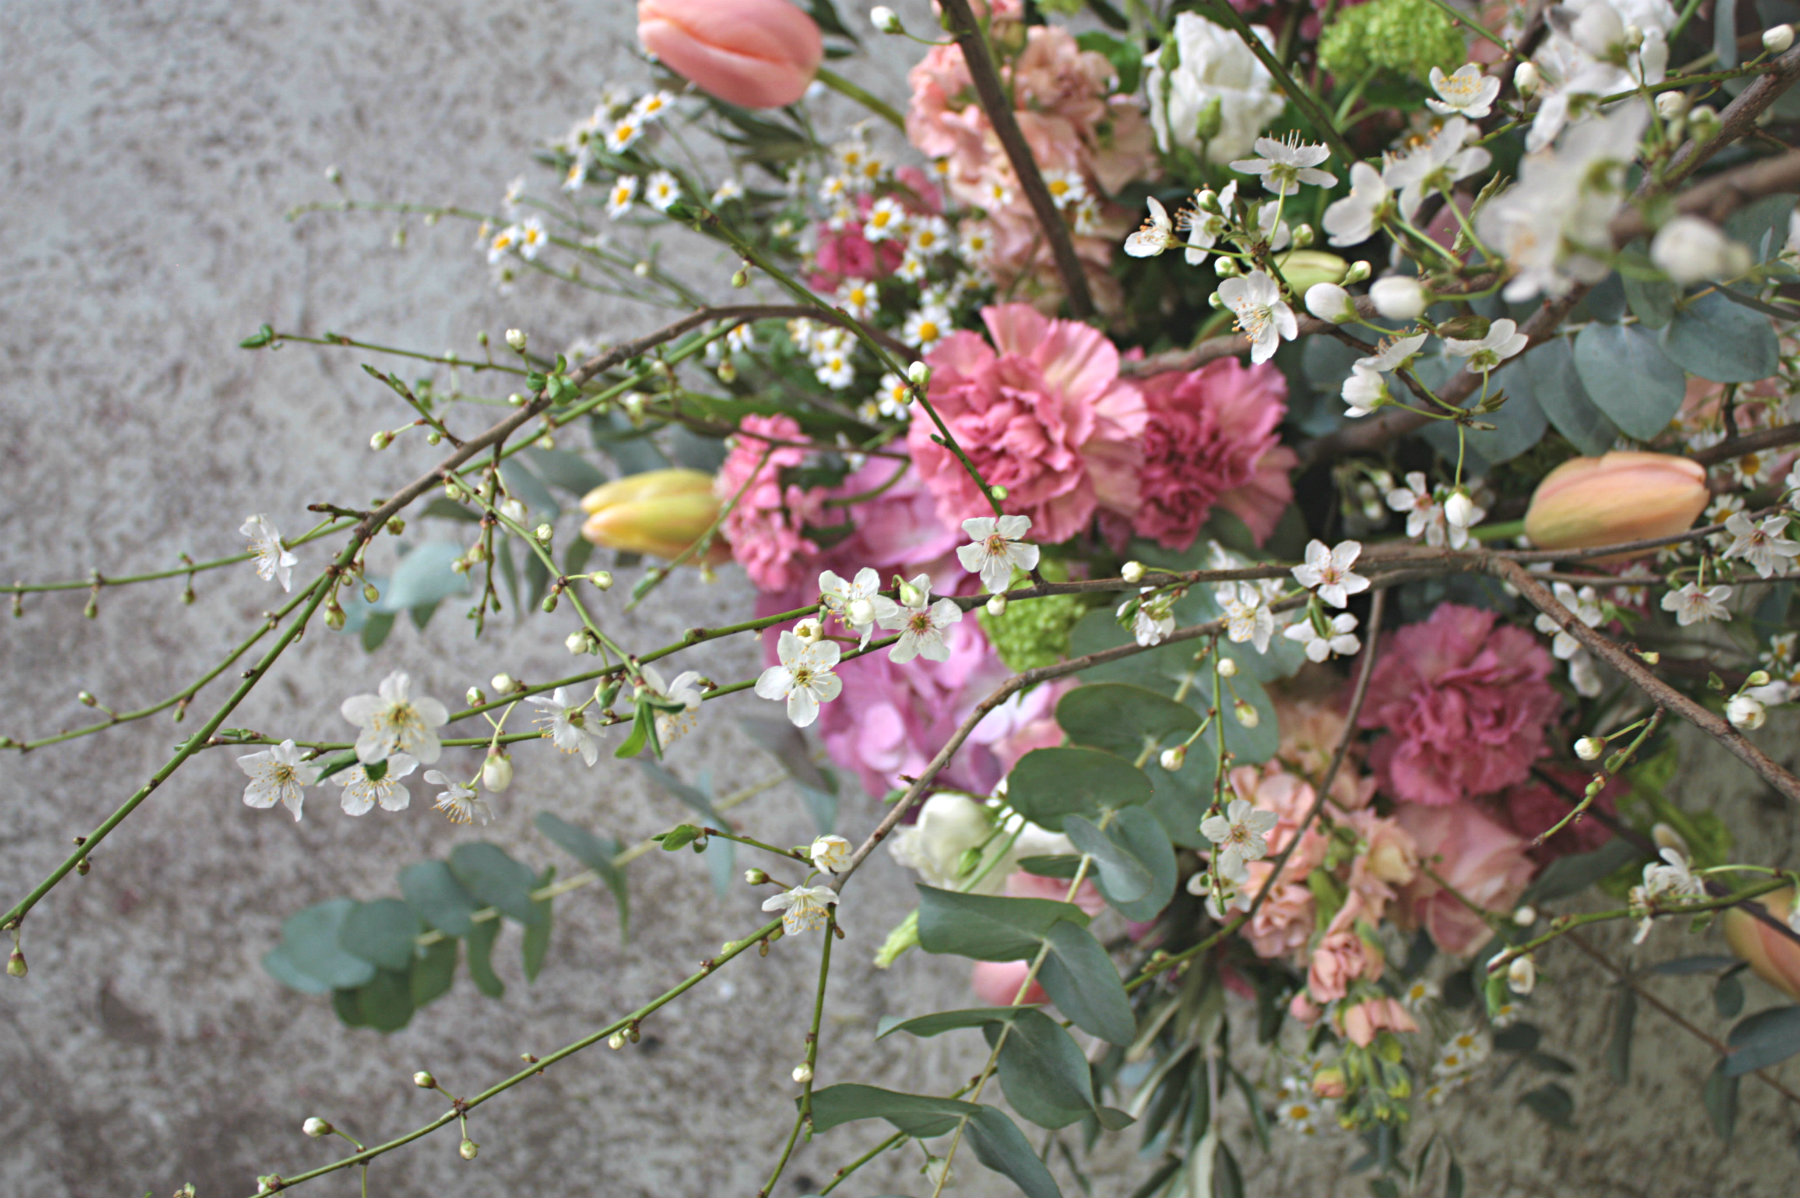 dcoration mariage toulouse evnementiel atelier fleuriste gali m - Decoratrice Mariage Toulouse